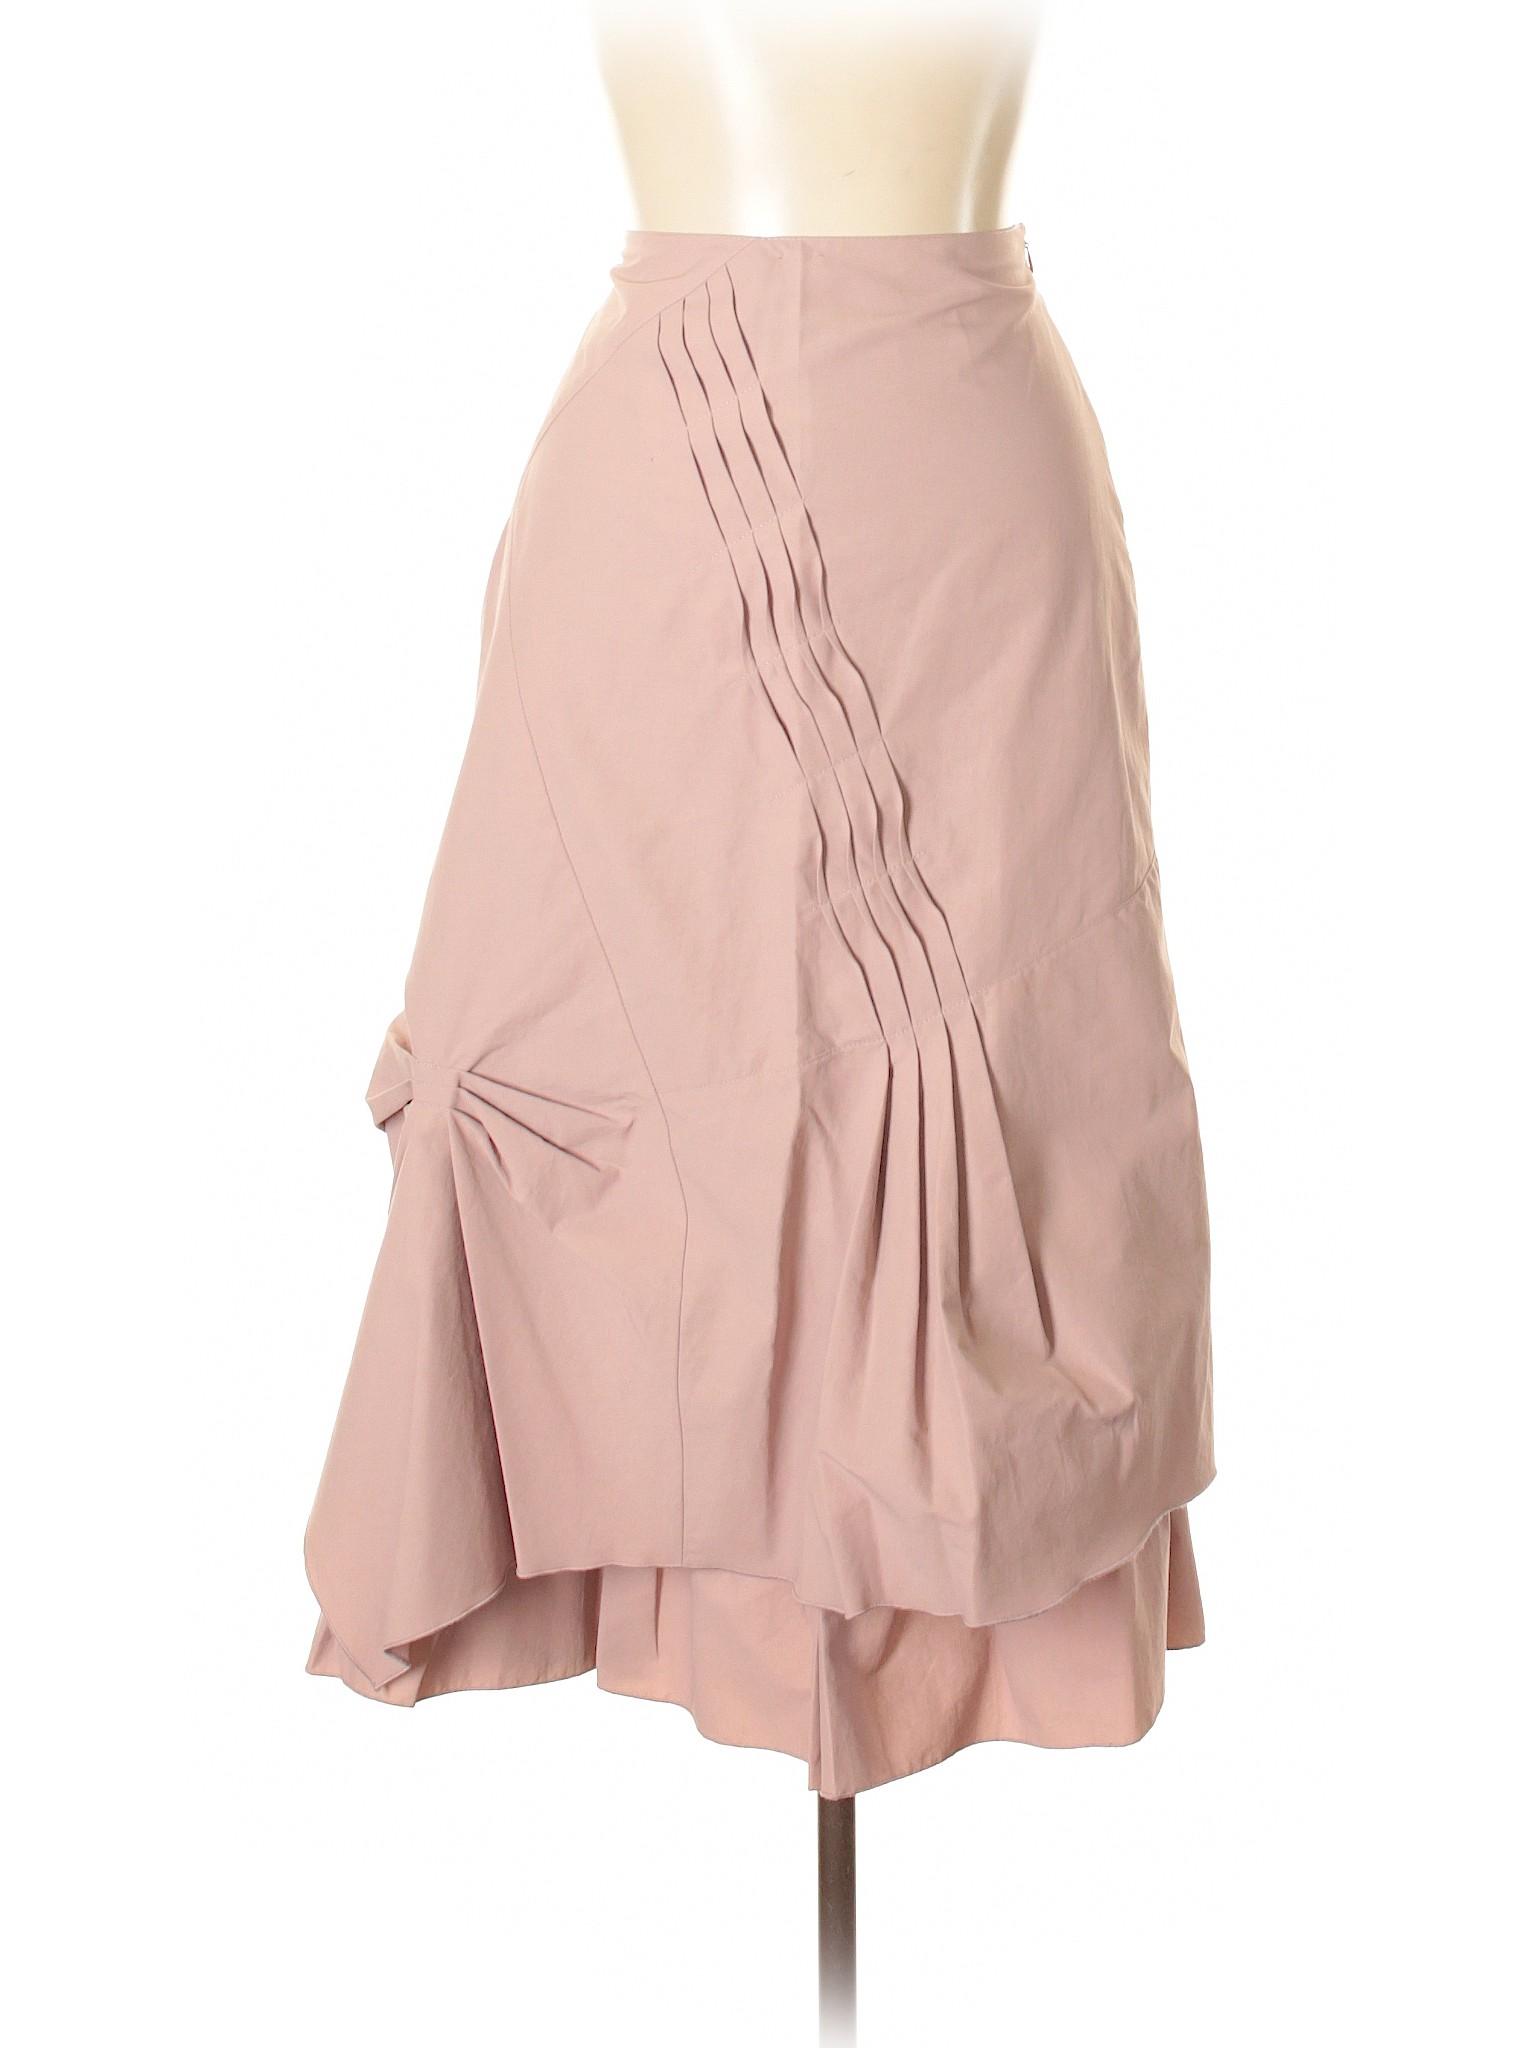 Boutique Formal Boutique Skirt Formal 70qBBX